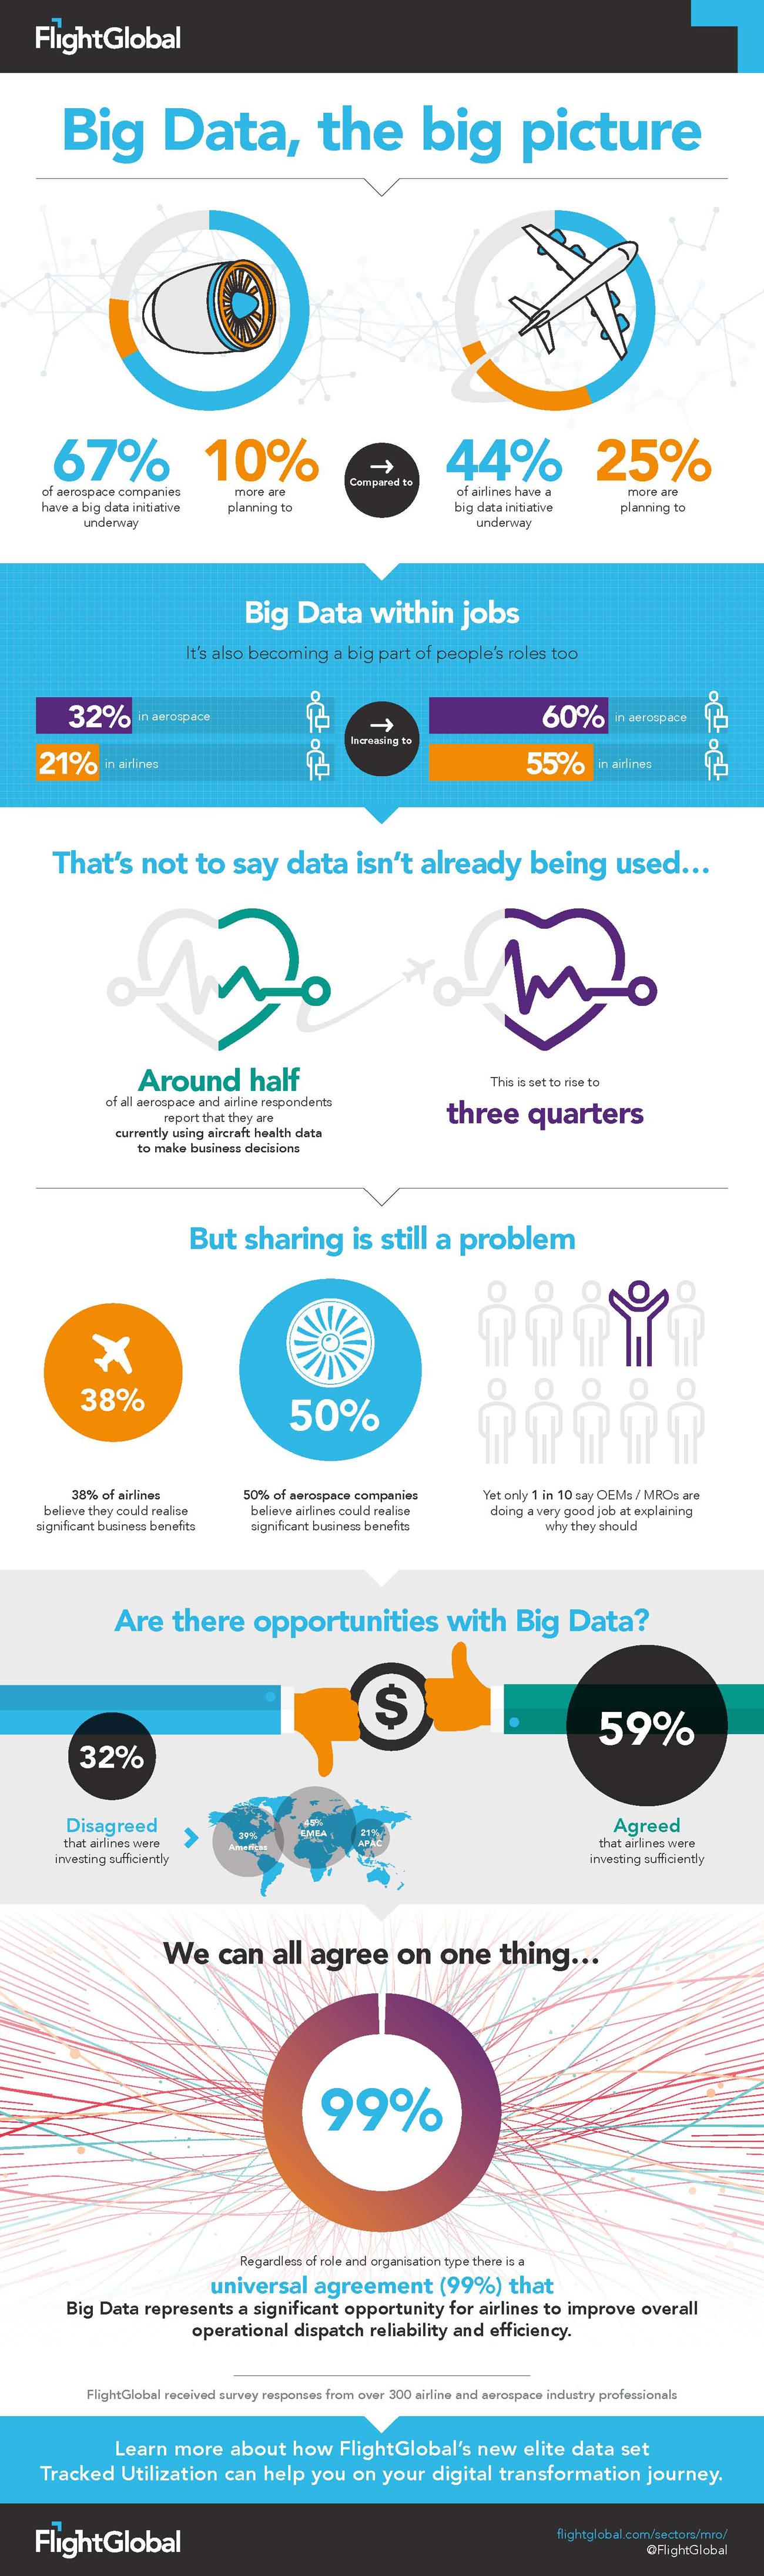 FlightGlobal Big Data Infographic